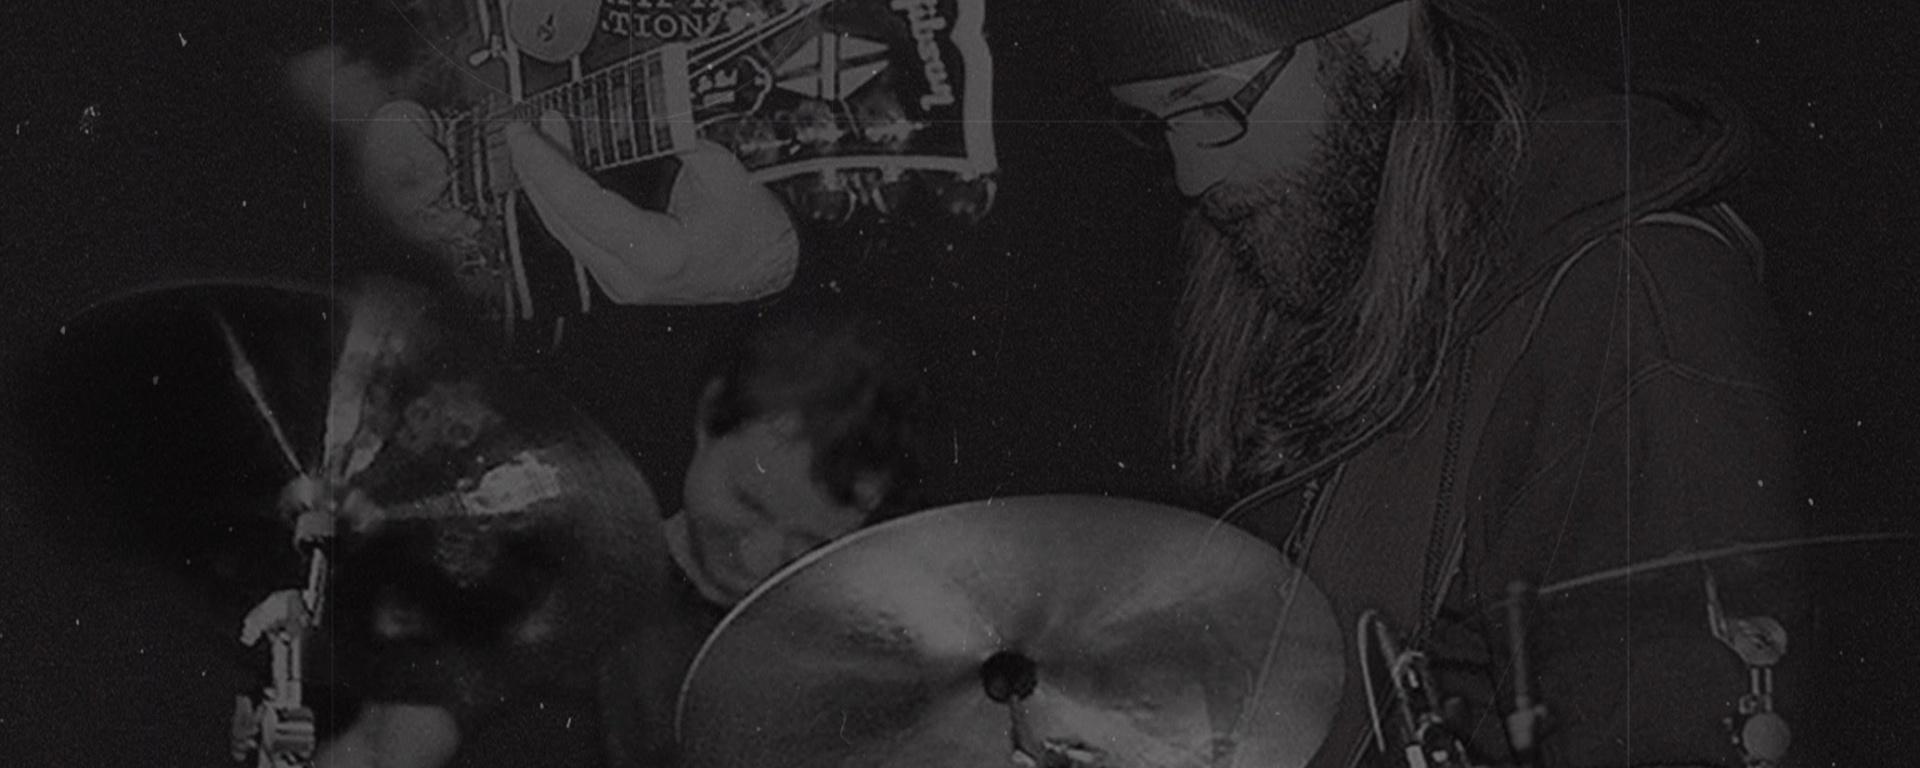 "Saskatoon's Before & Apace Are Now Streaming Debut Album ""The Denisovan"" - Contemporary-Establishment"